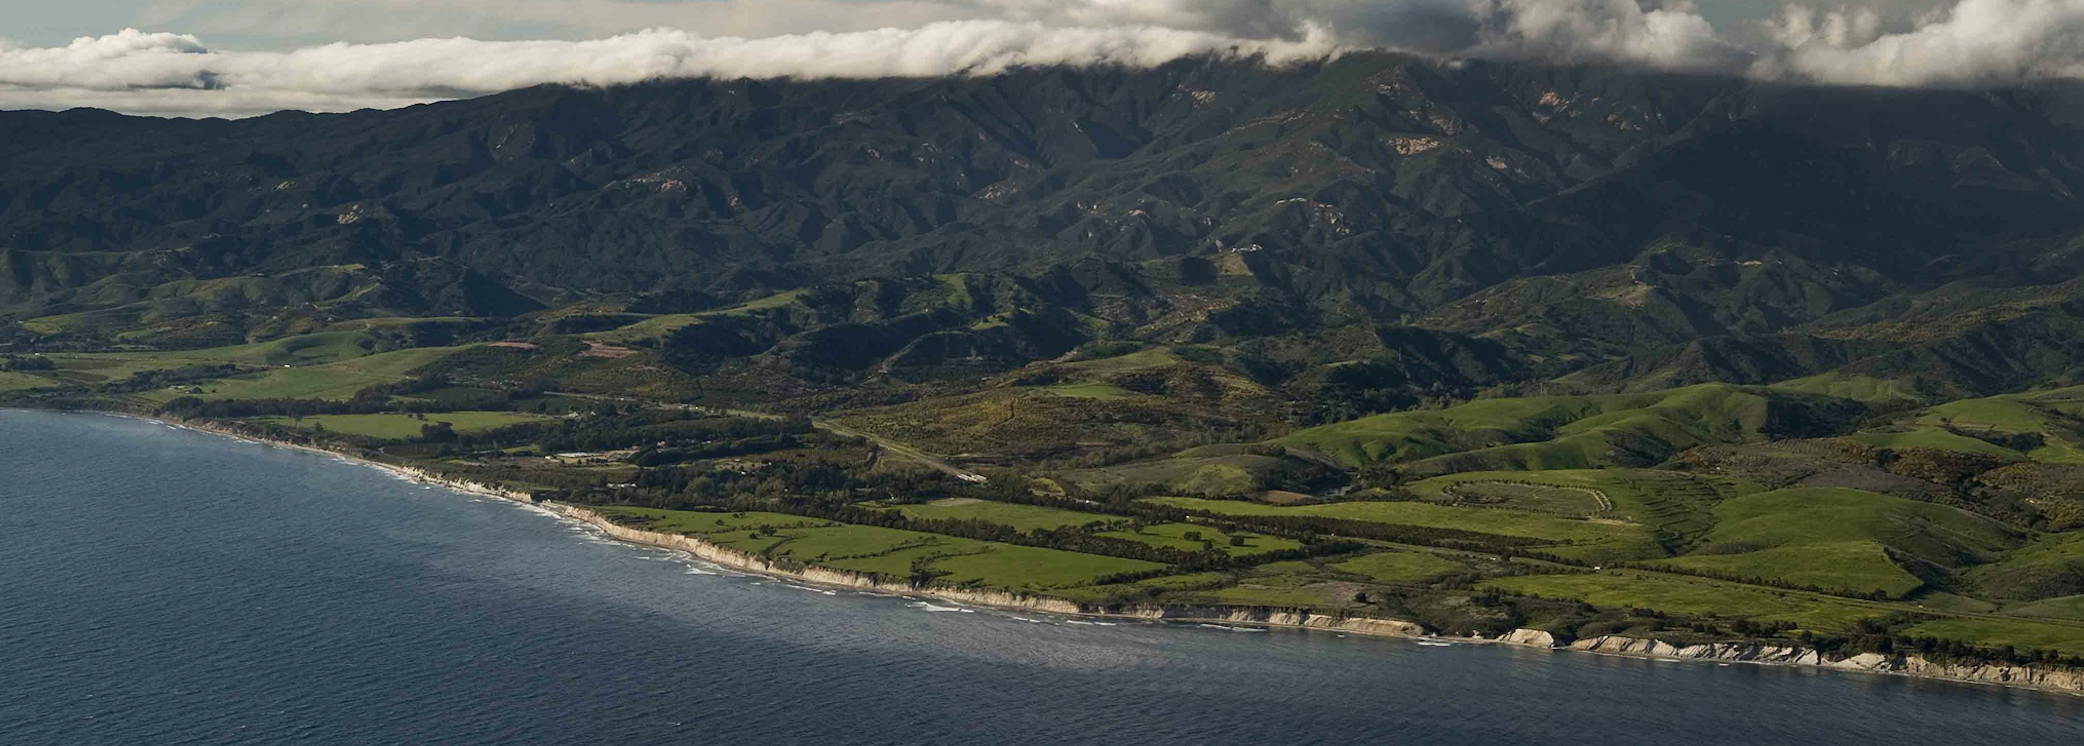 Bill_Dewey_Coastal_Aerial_Overview_banner.png